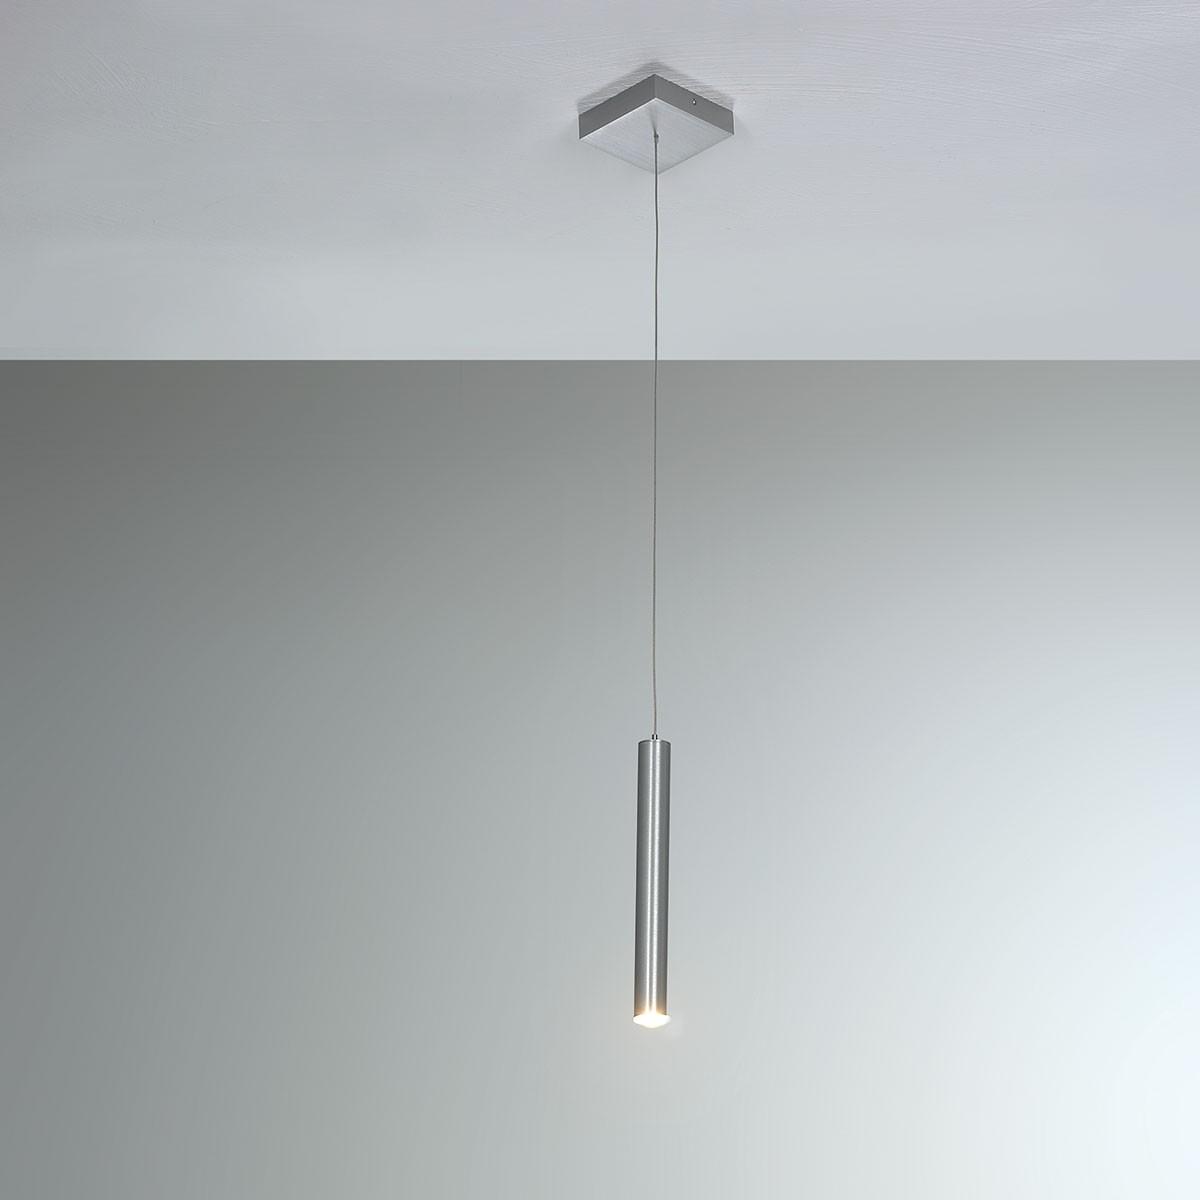 Bopp Plus LED Pendelleuchte, mit Casambi Modul, 1-flg., Aluminium geschliffen